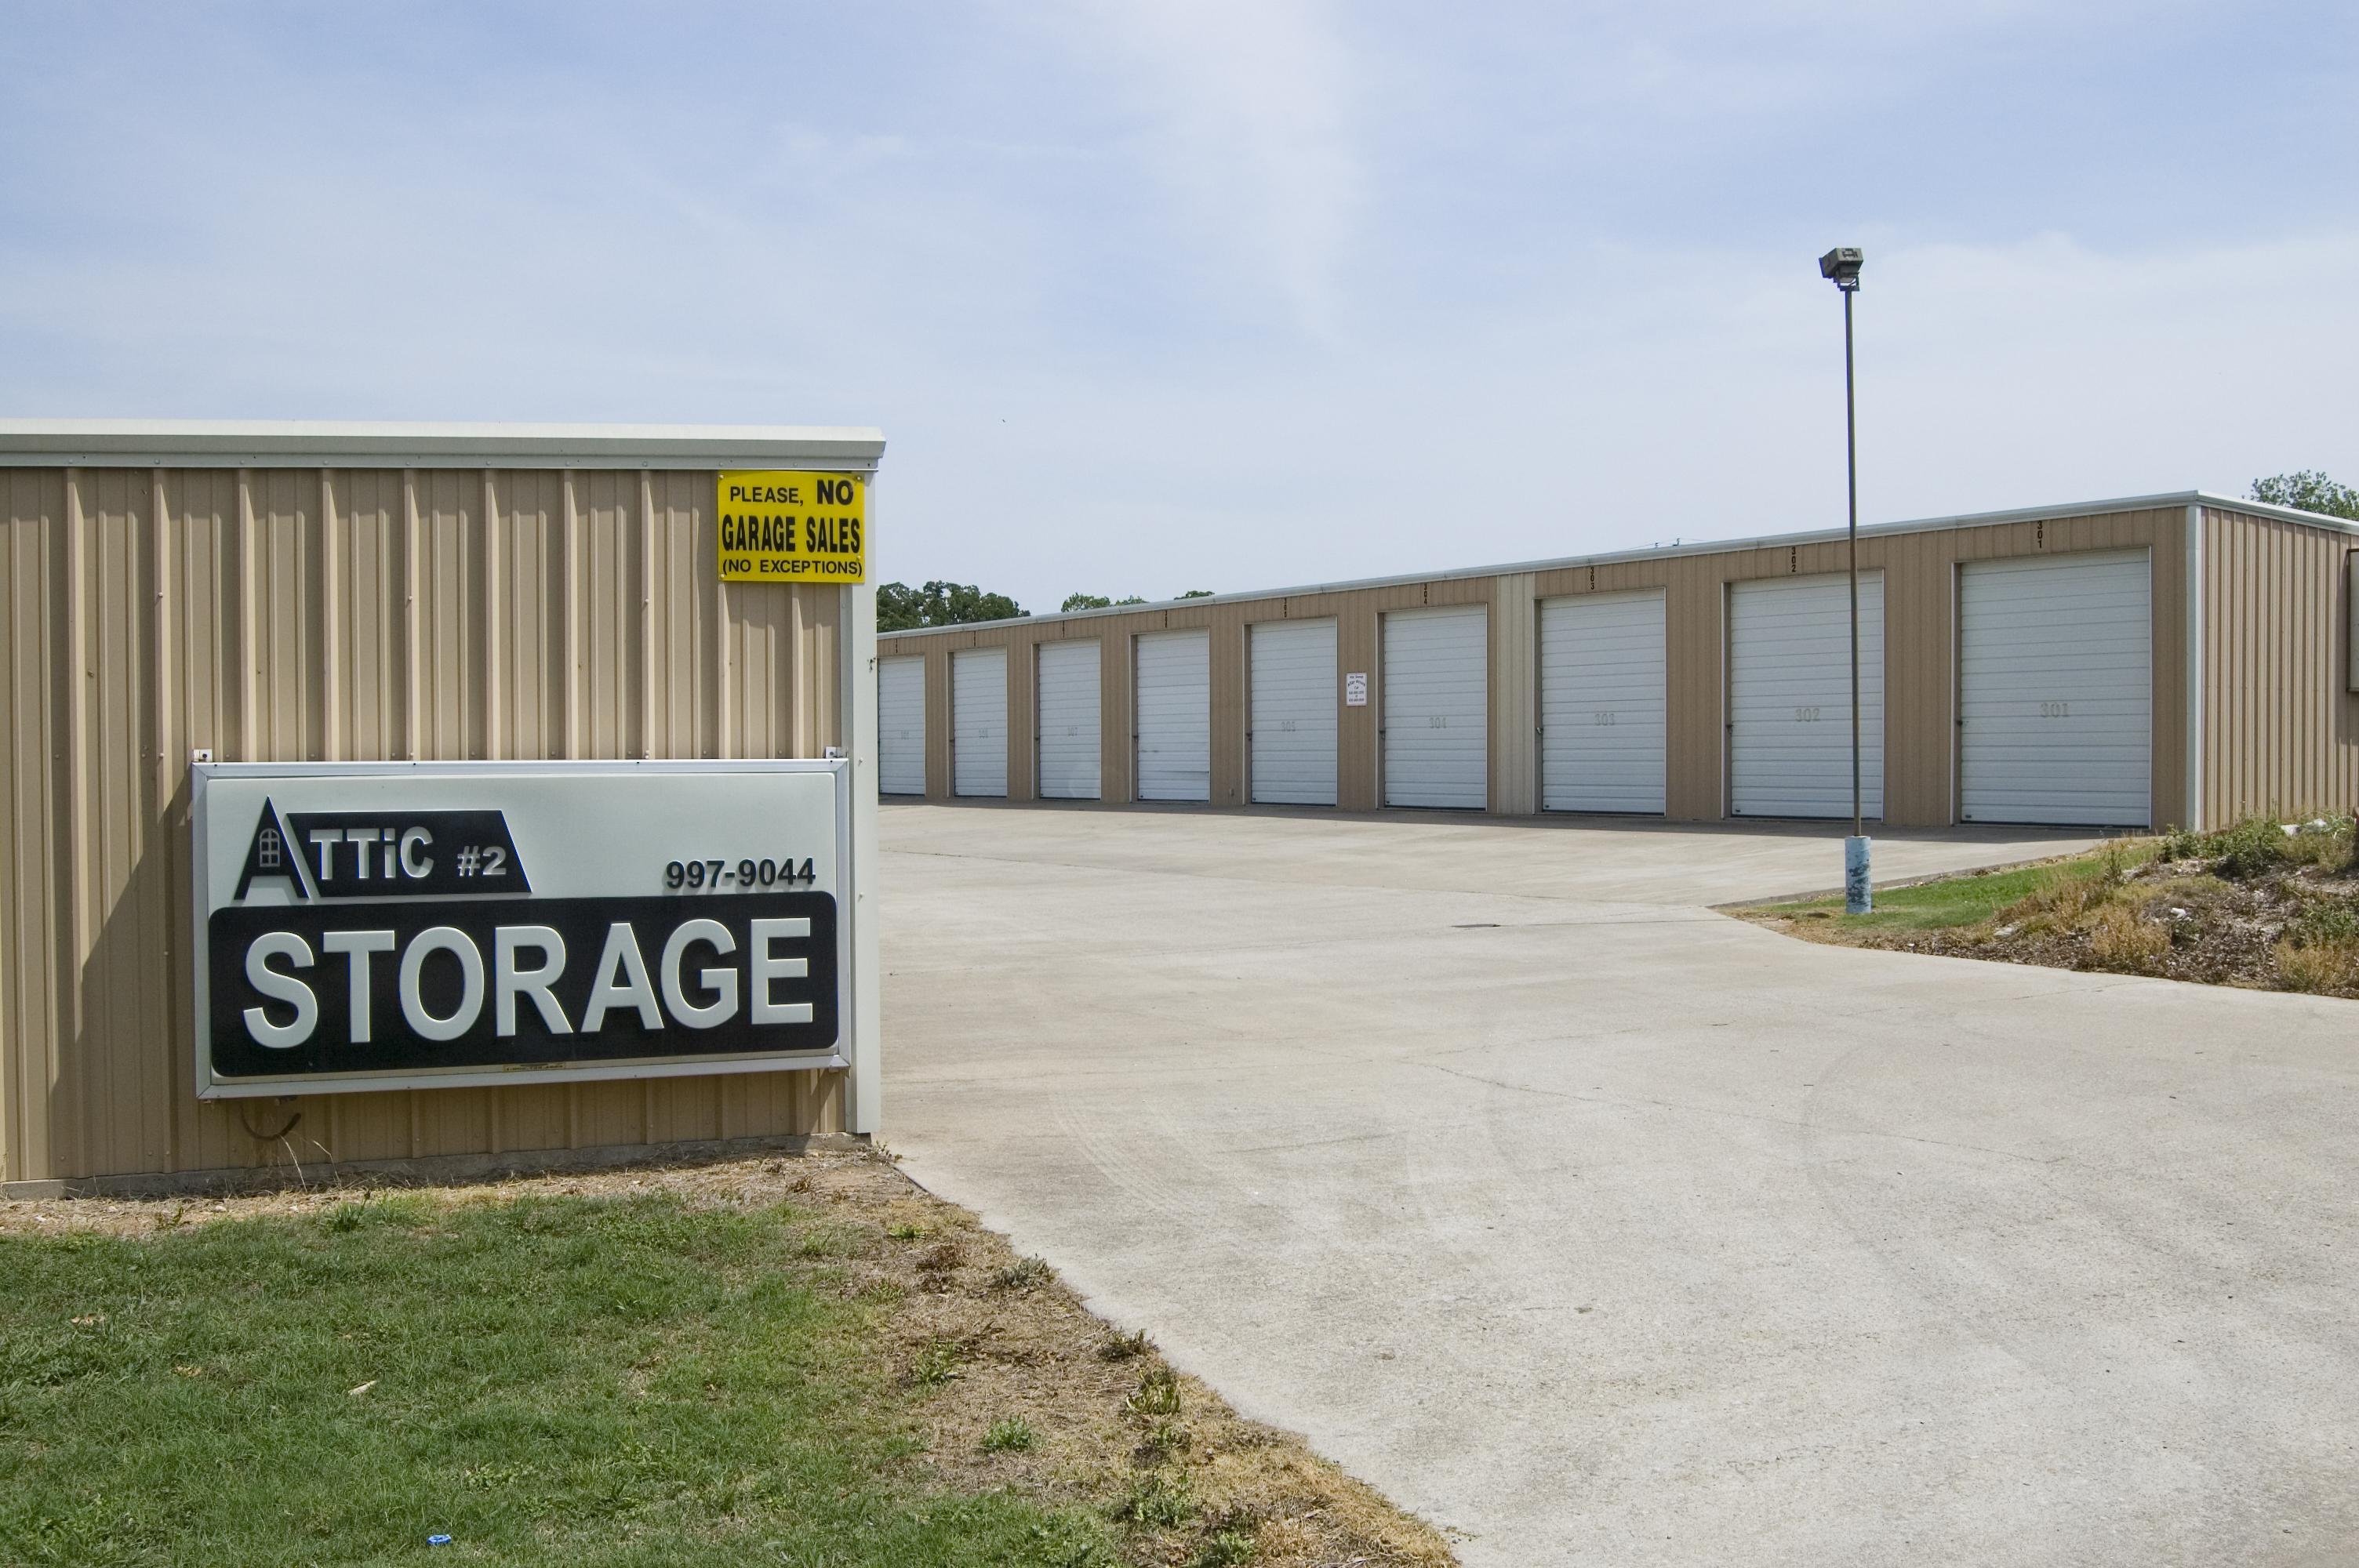 Attic Storage #2